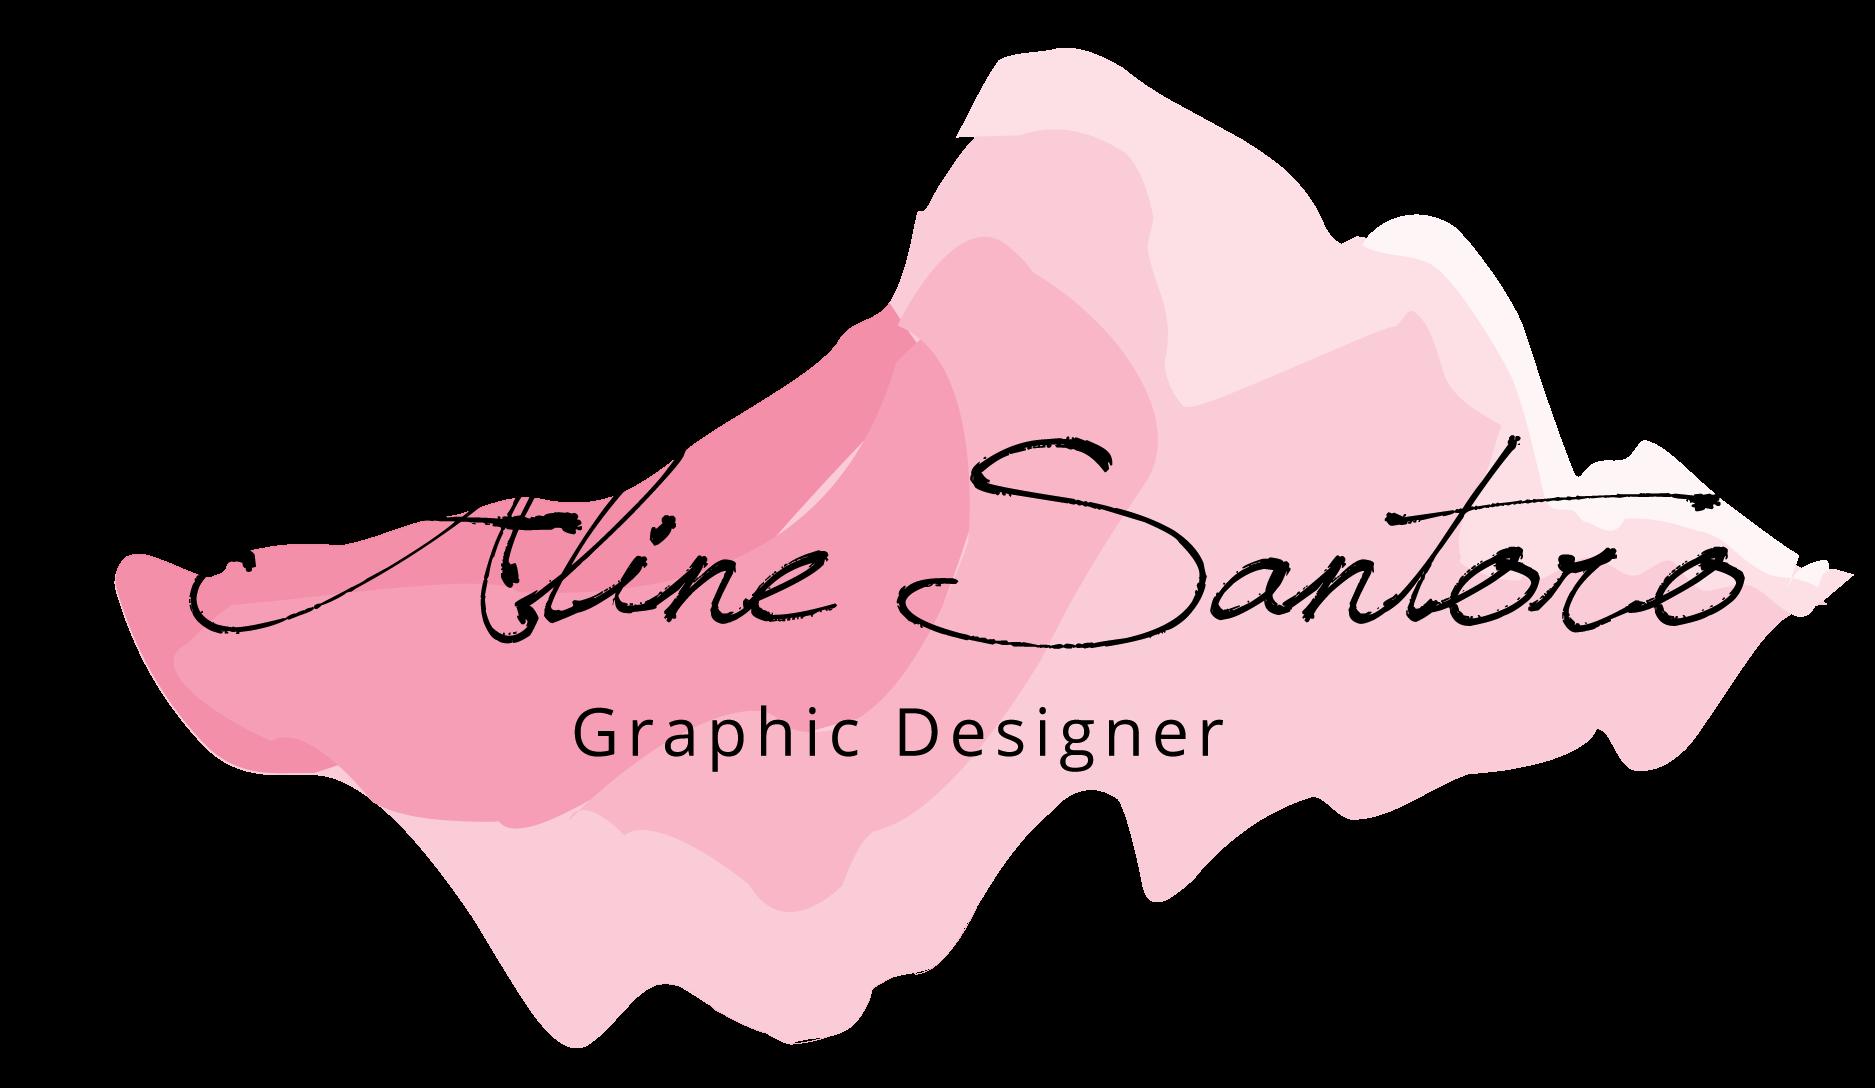 Aline Santoro Graphic Designer logo